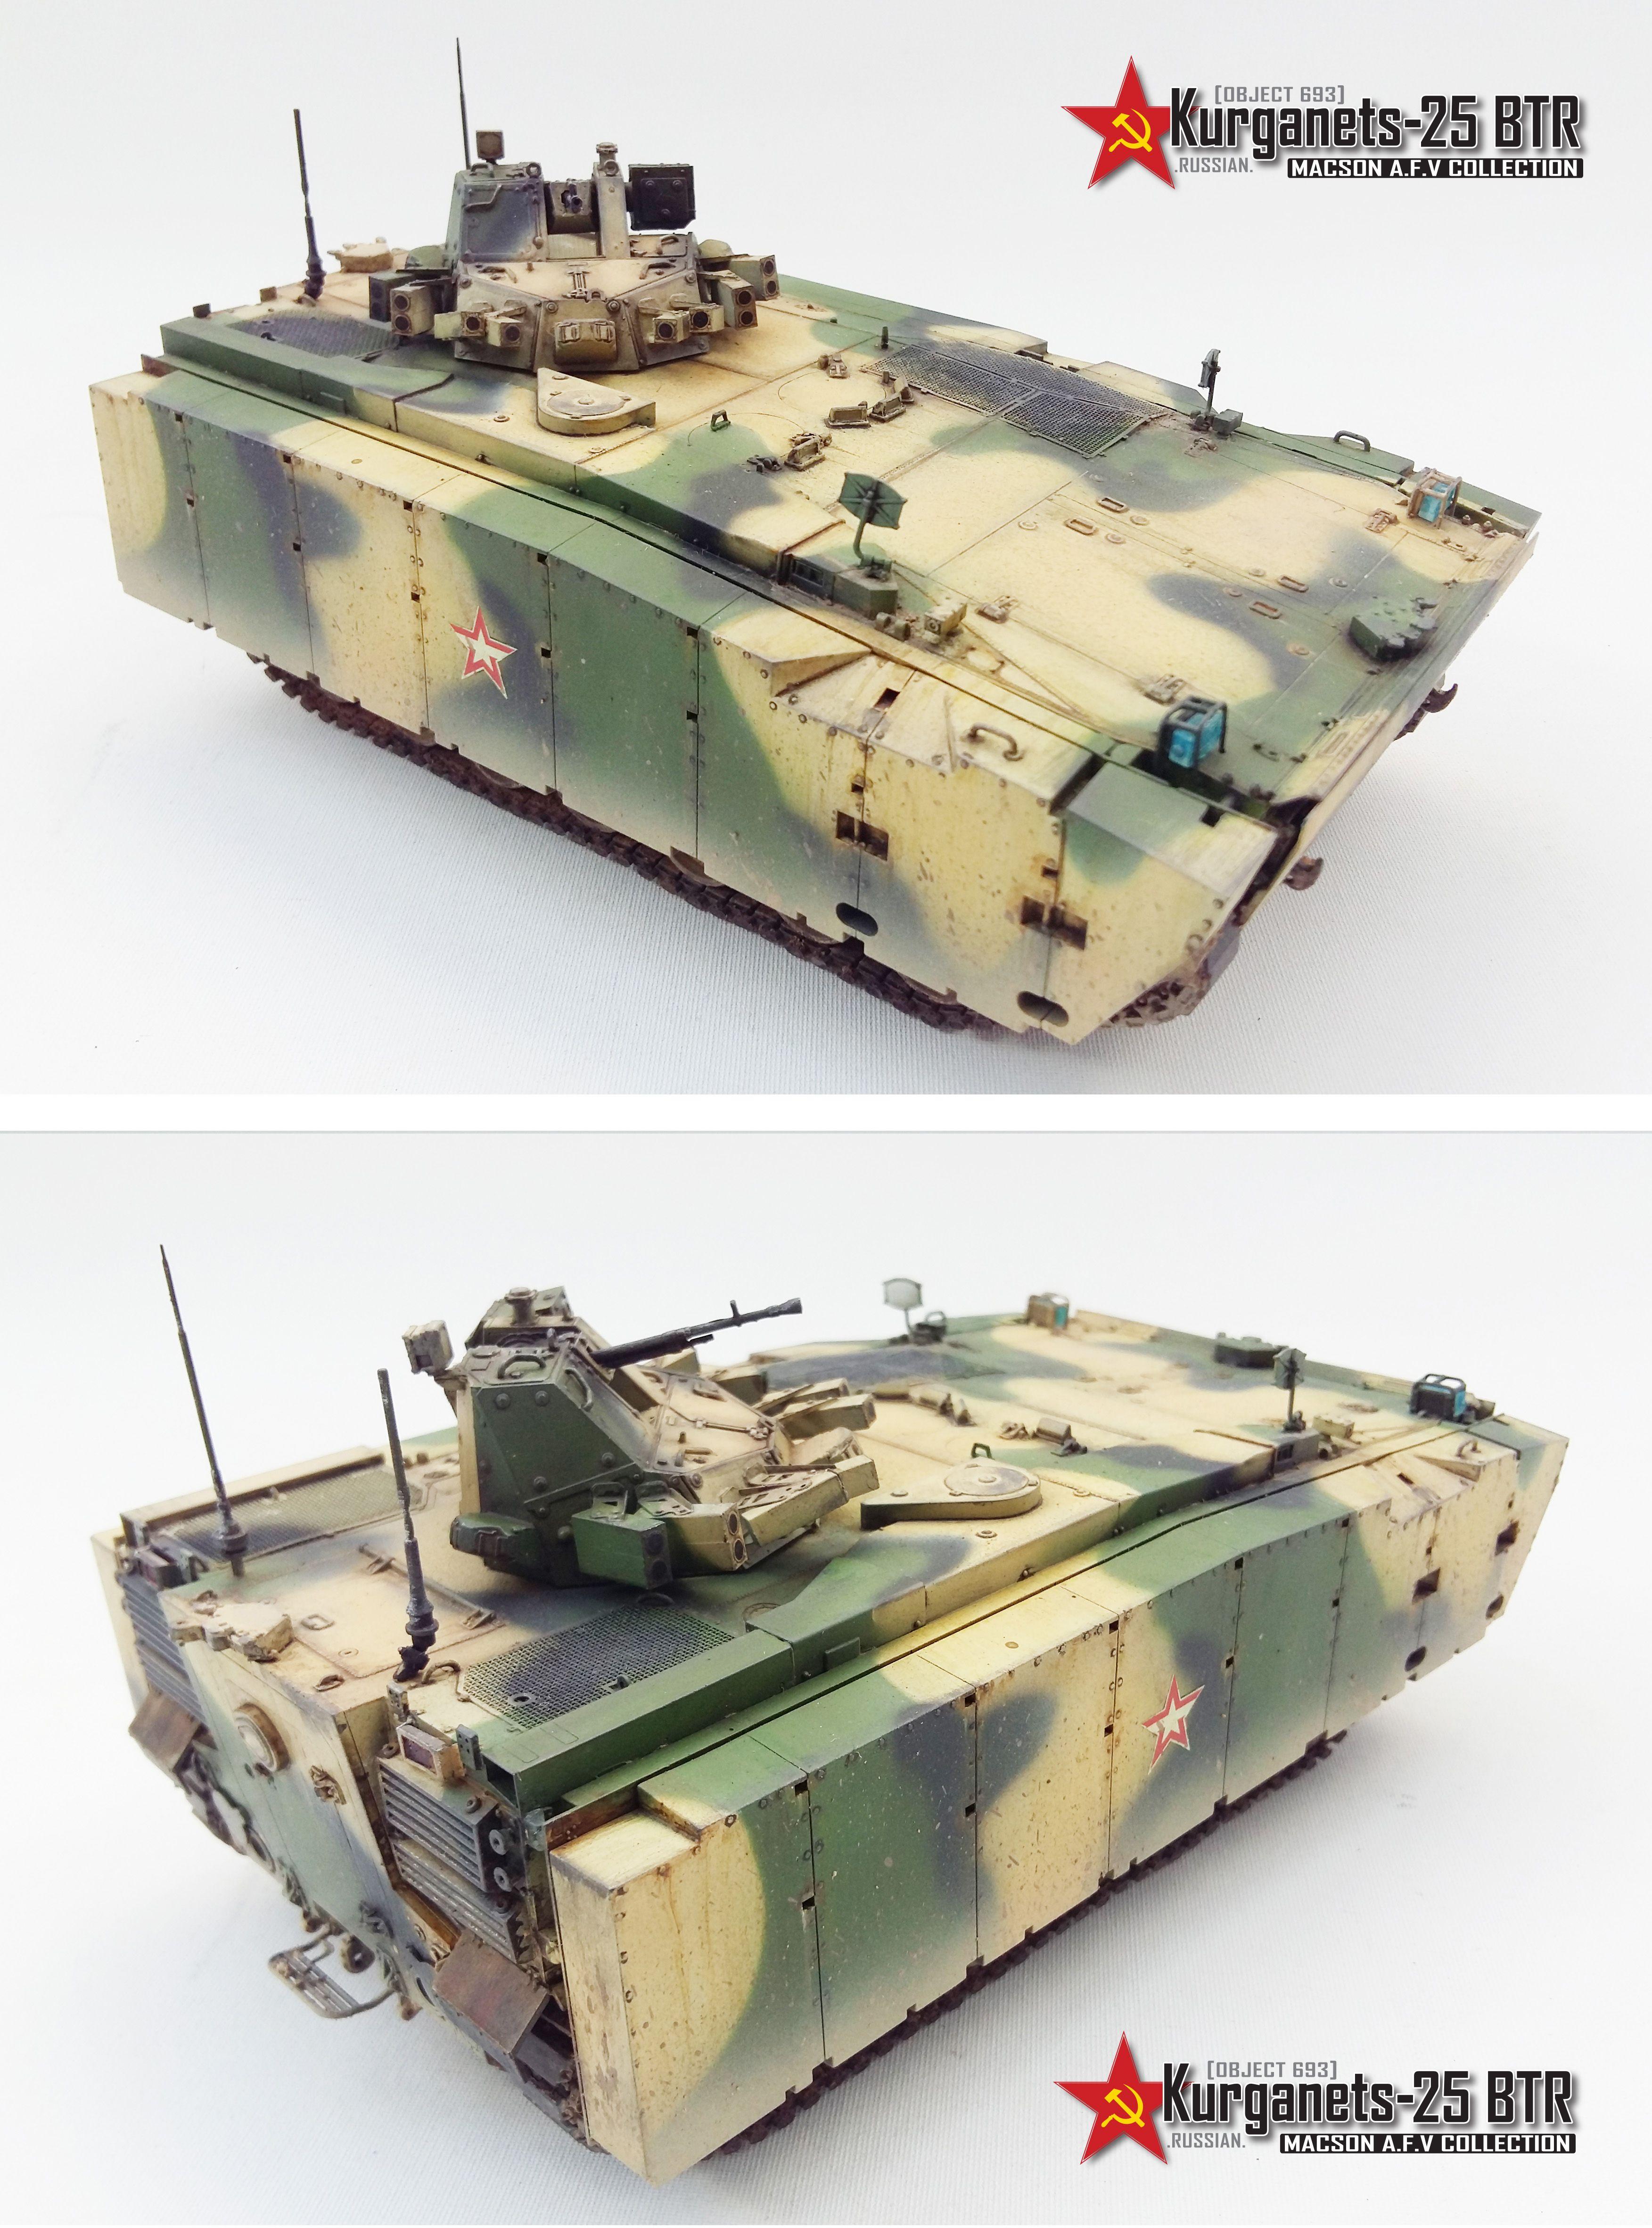 Panda Hobby 1:35 Kurganets-25 BTR | Kurganets-25 BTR by